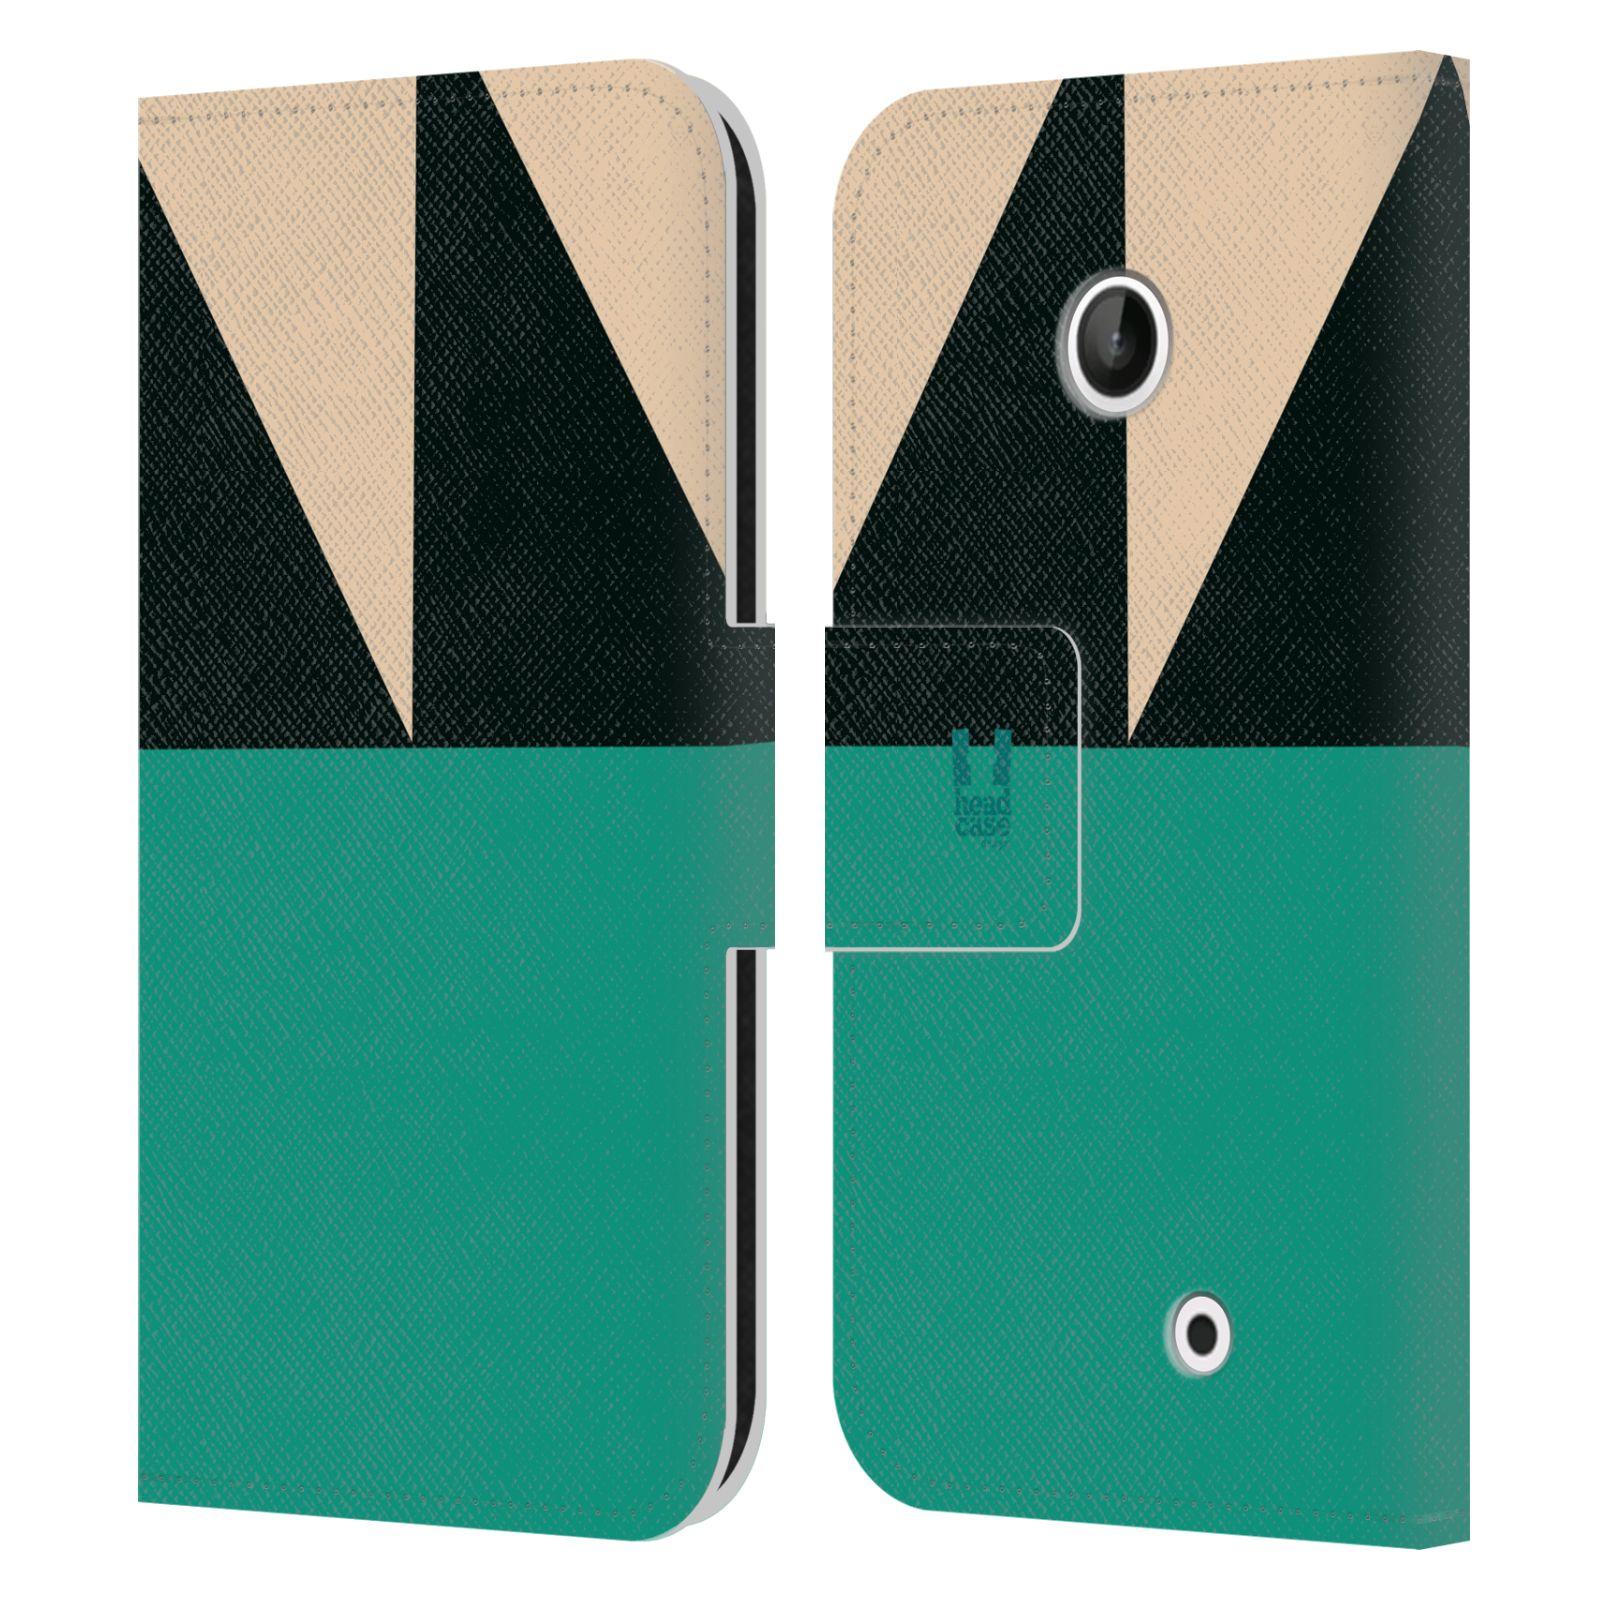 HEAD CASE Flipové pouzdro pro mobil Nokia LUMIA 630/630 DUAL barevné tvary moře modrá